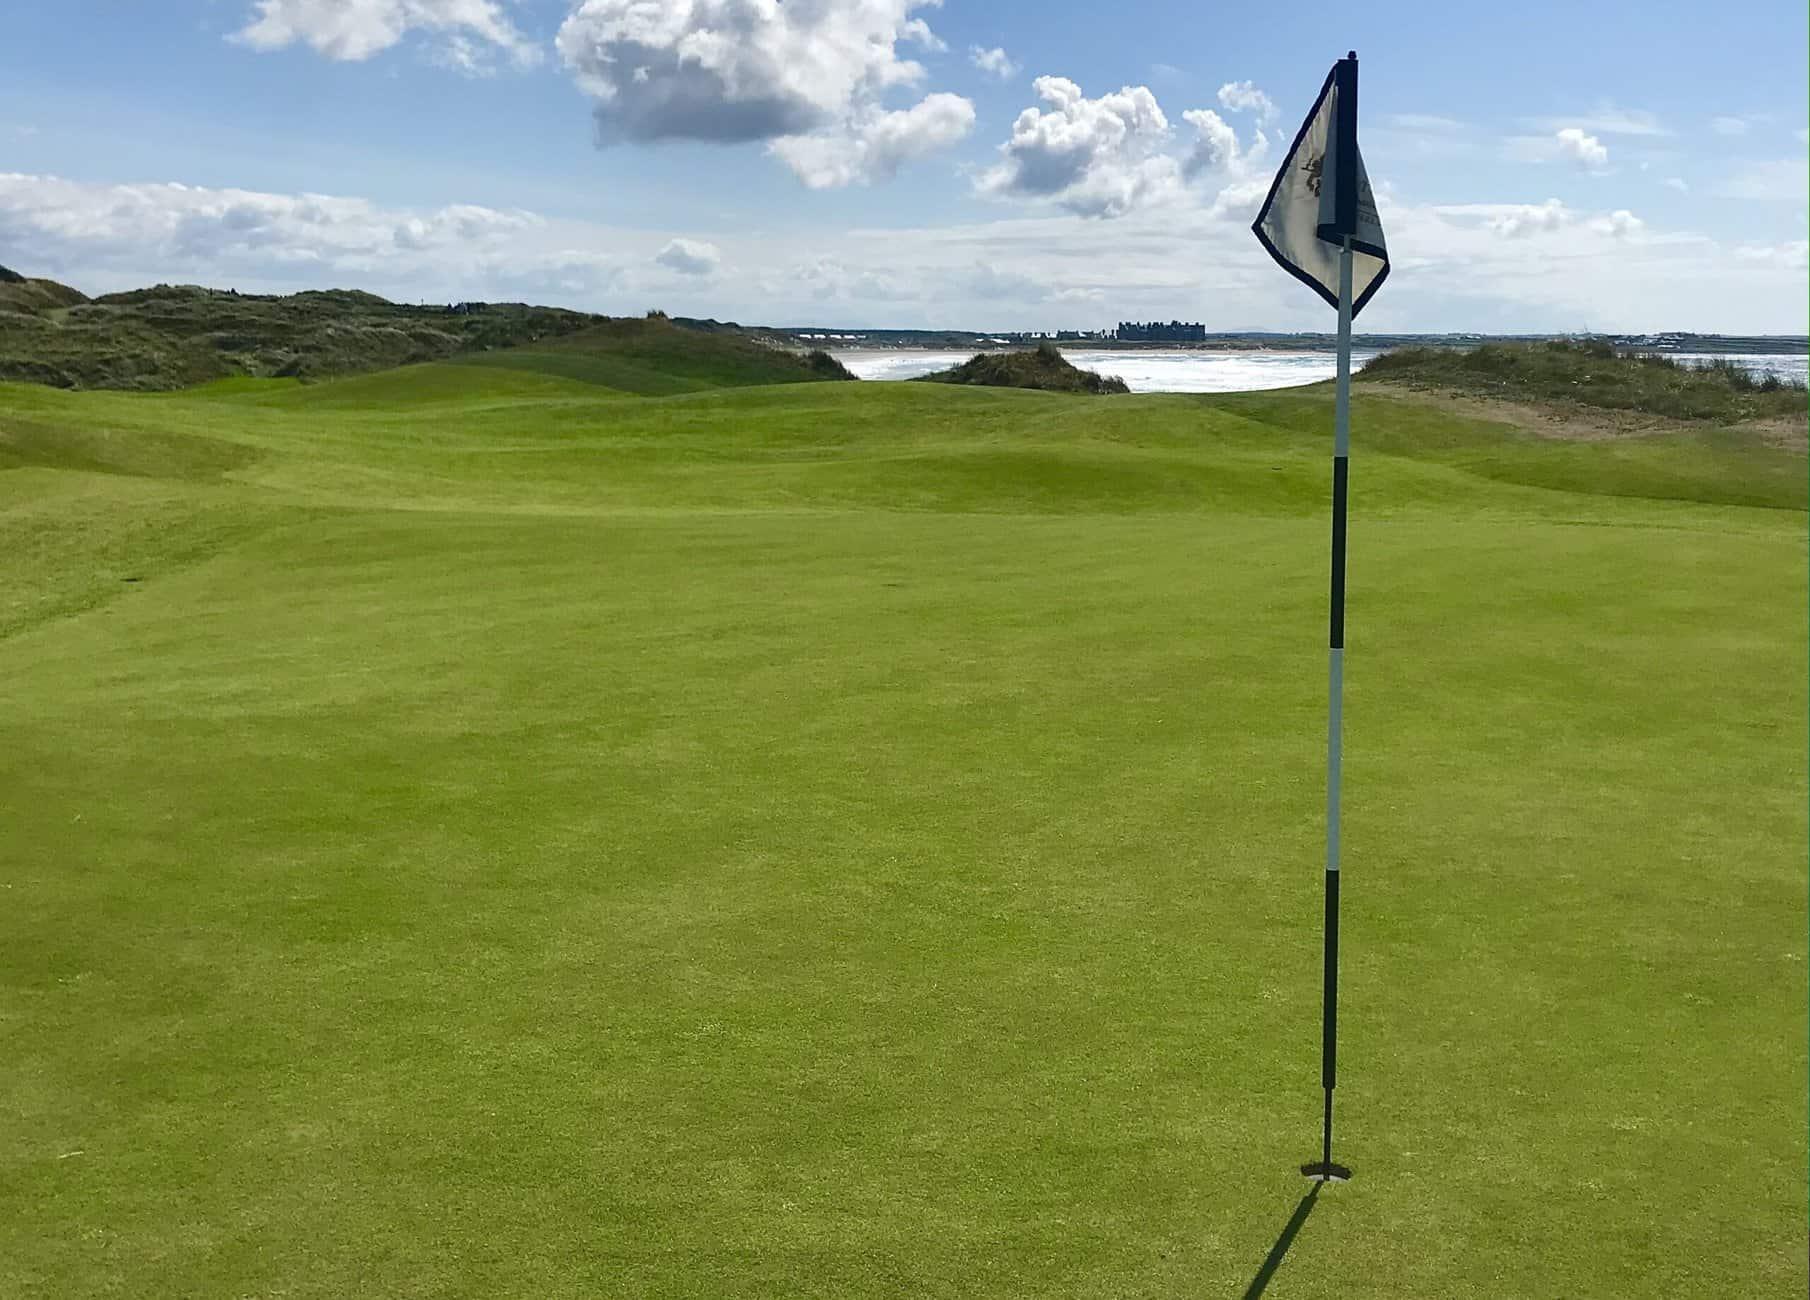 The views across Doonbeg Beach in County Clare